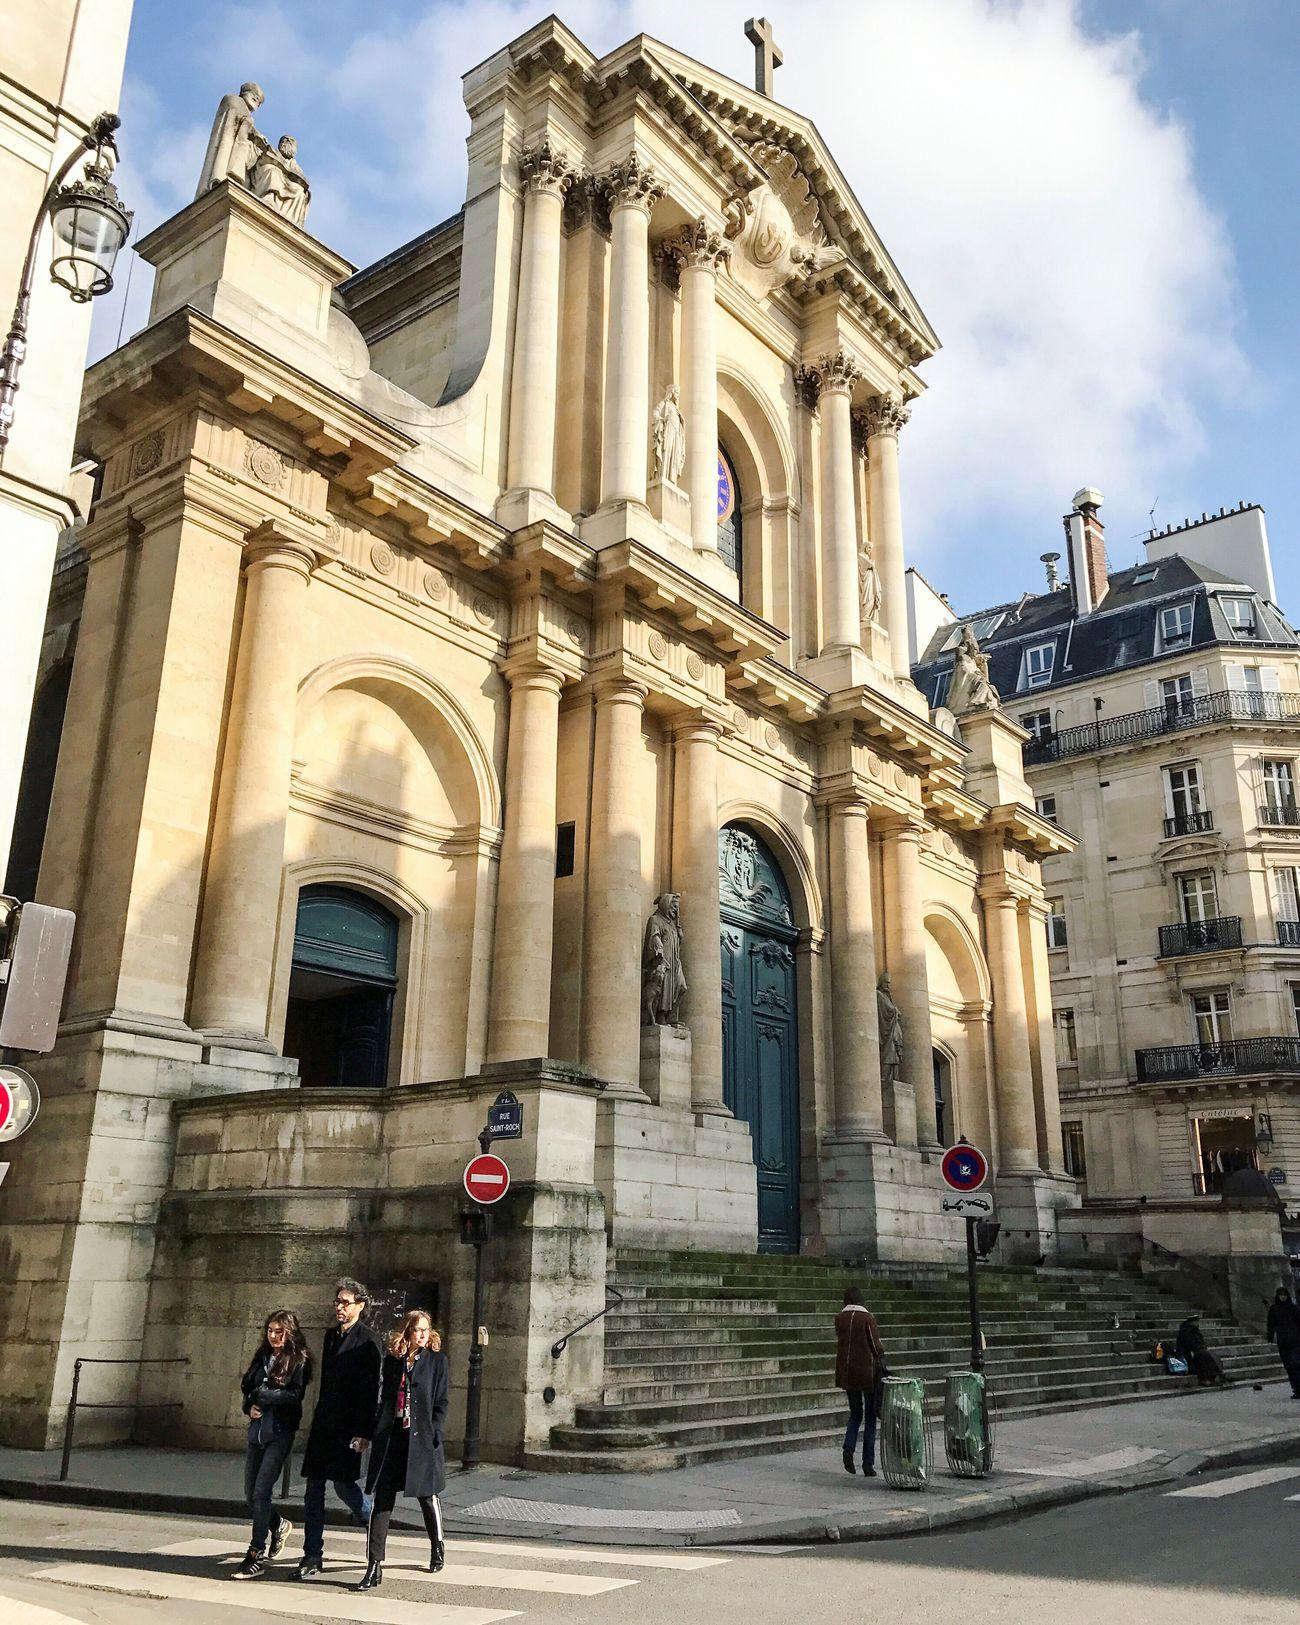 Bon dimanche! Happy Sunday Architecture Travel Destinations Parisweloveyou Paris EyeEm Best Shots Place Of Worship Photooftheday Eyem Best Shot - Architecture Paris ❤